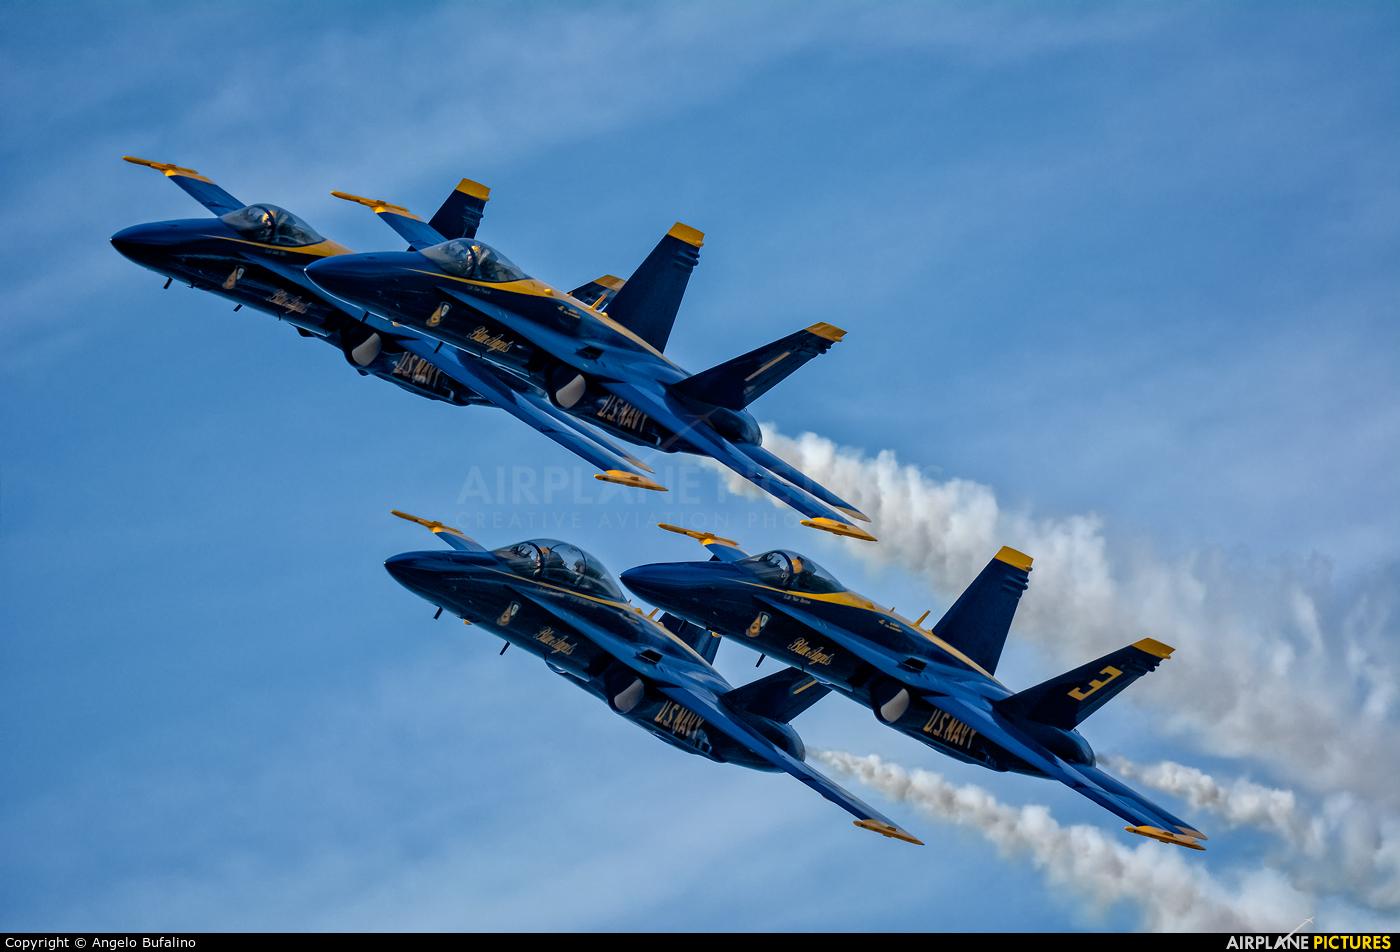 USA - Navy : Blue Angels 163484 aircraft at Cleveland - Burke Lakefront